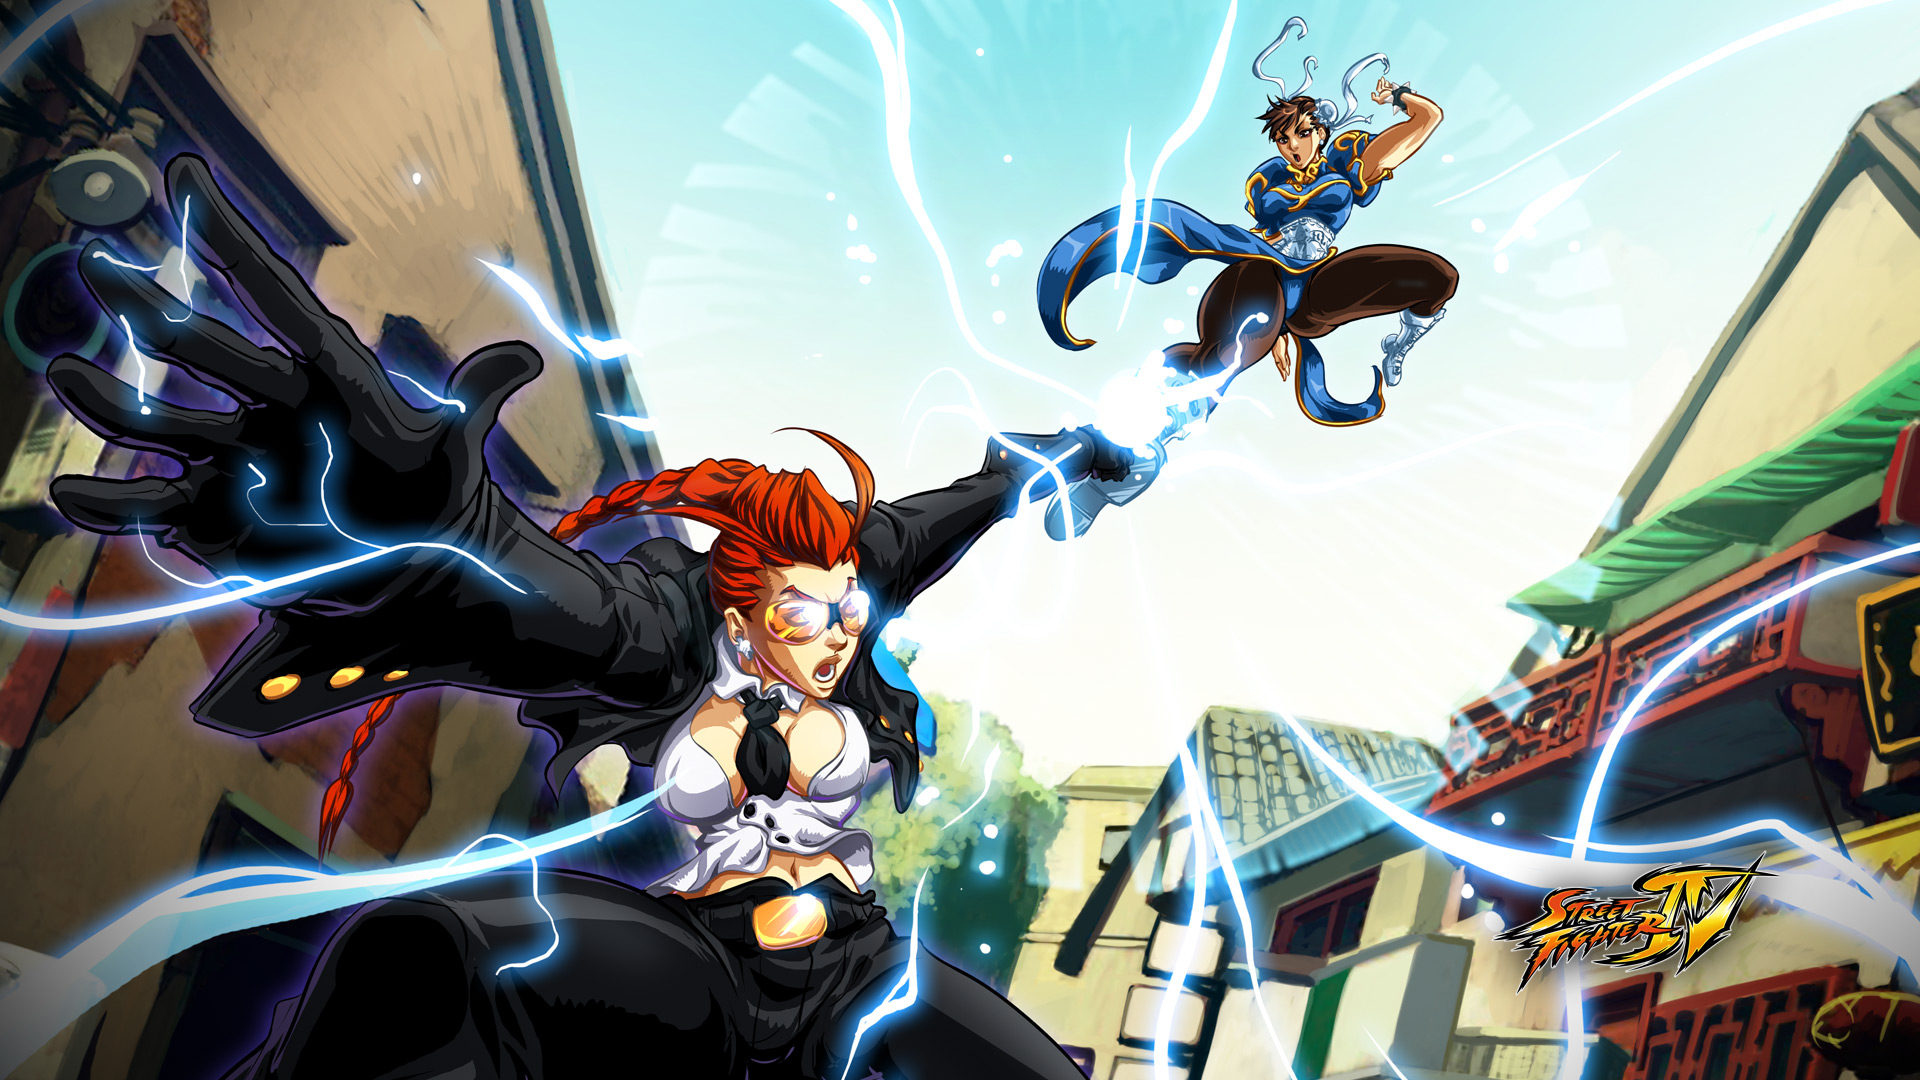 Street Fighter 5 Wallpaper: Street Fighter 4 Wallpaper